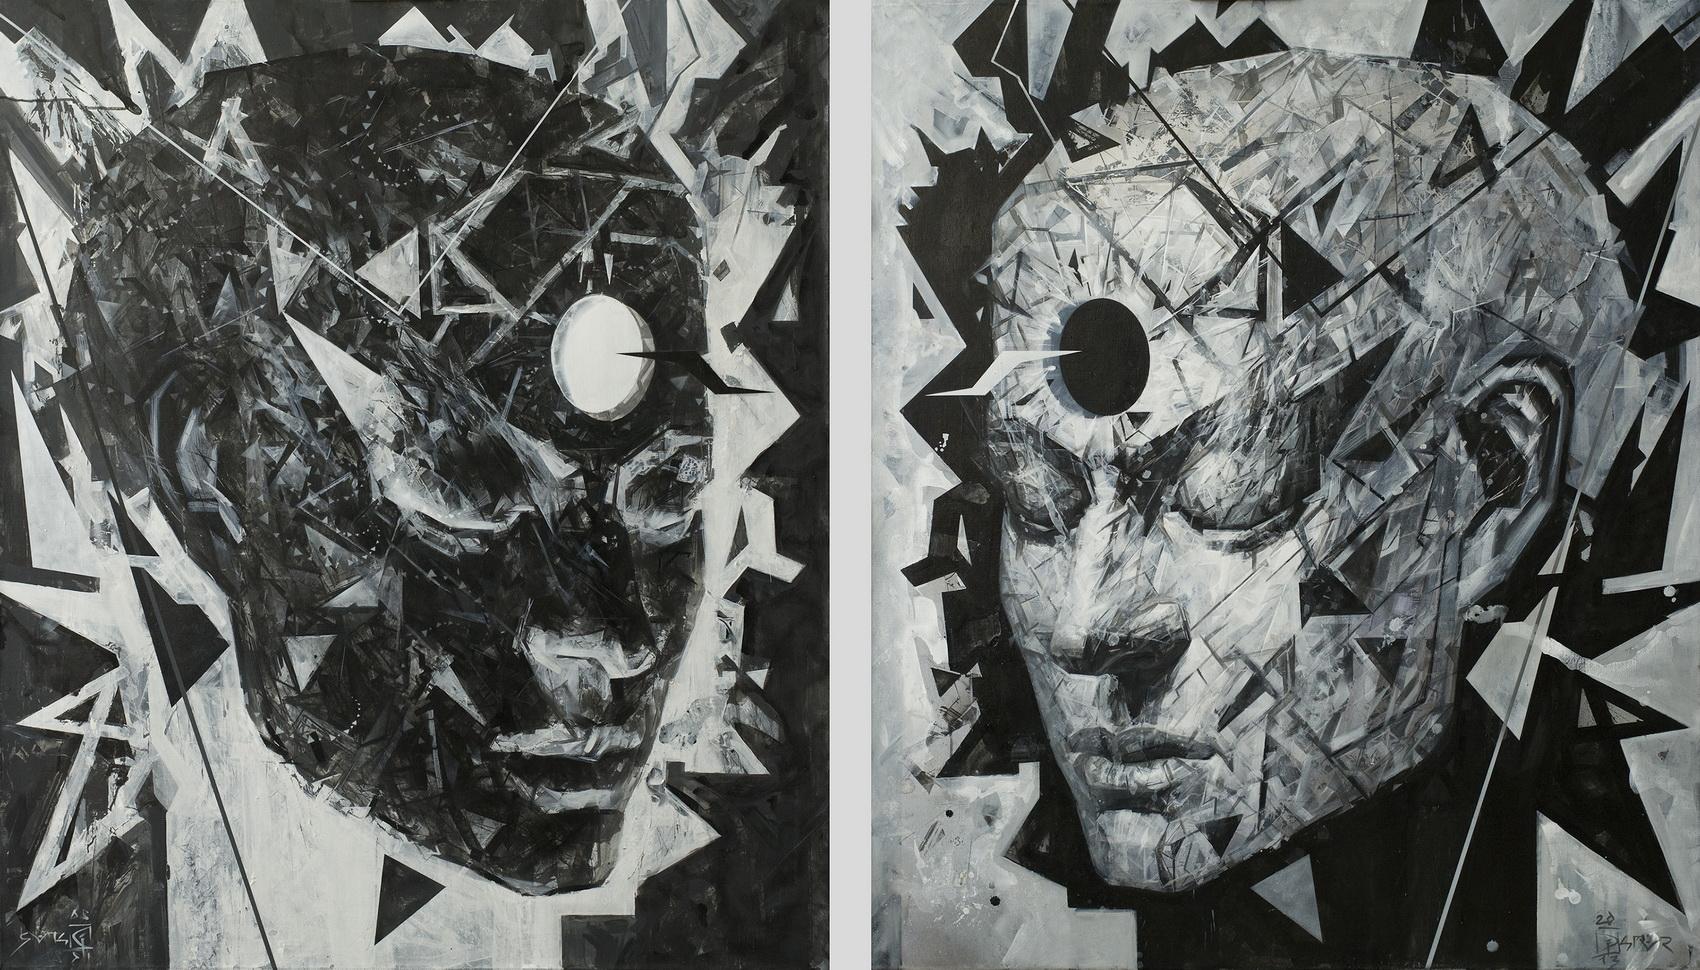 InVersion, 2013, Acrylic on canvas, 140 x 120 cm, $1500